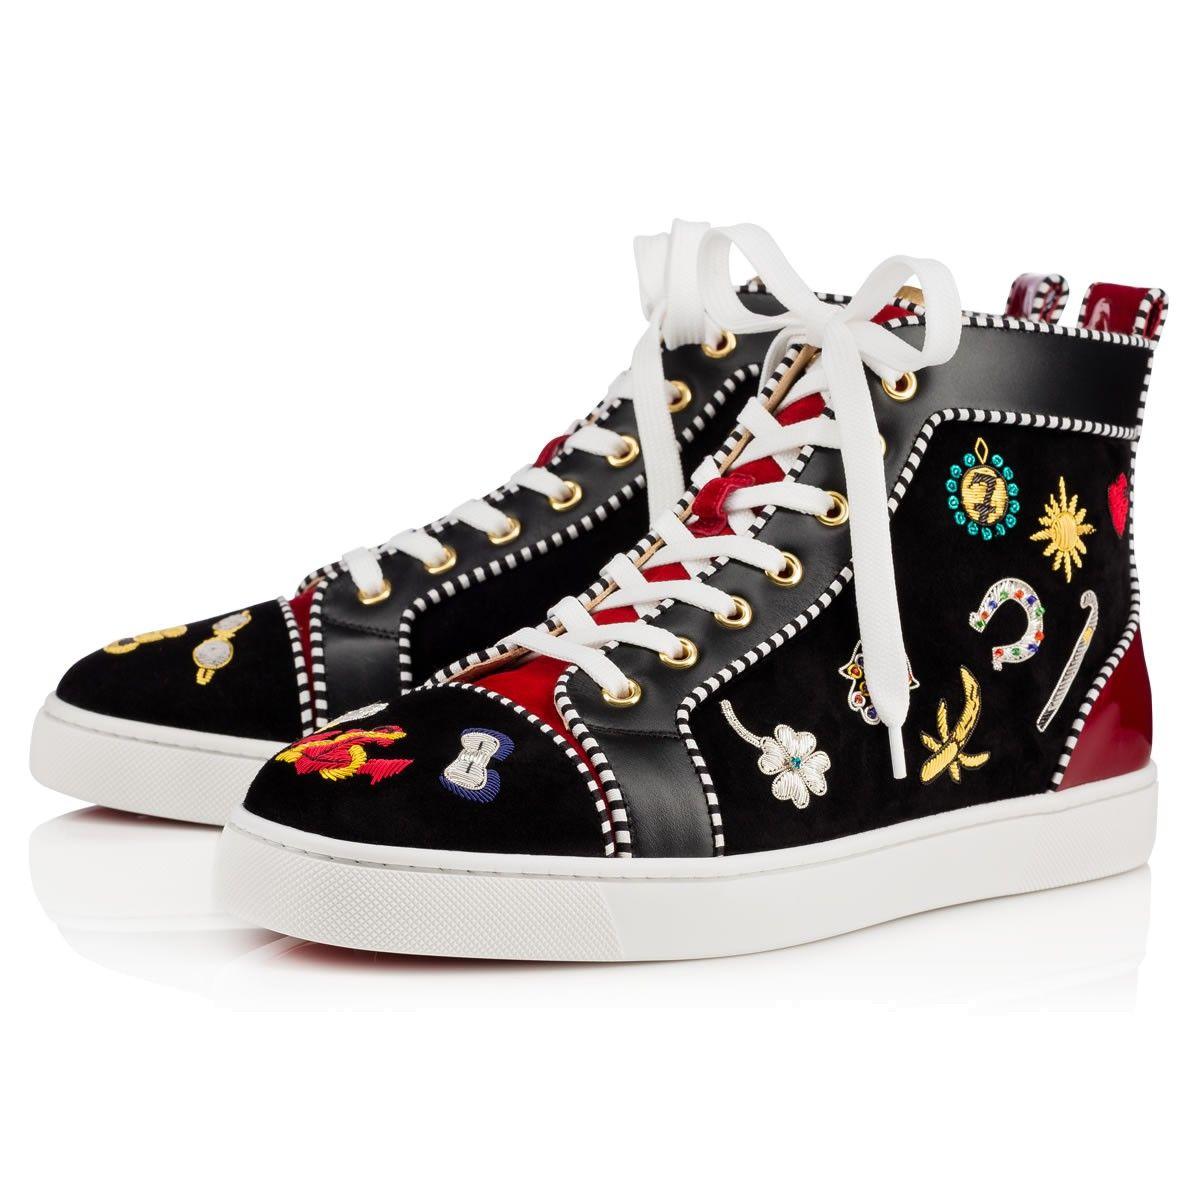 Shoes Louis N Luck Men's Flat Christian Louboutin